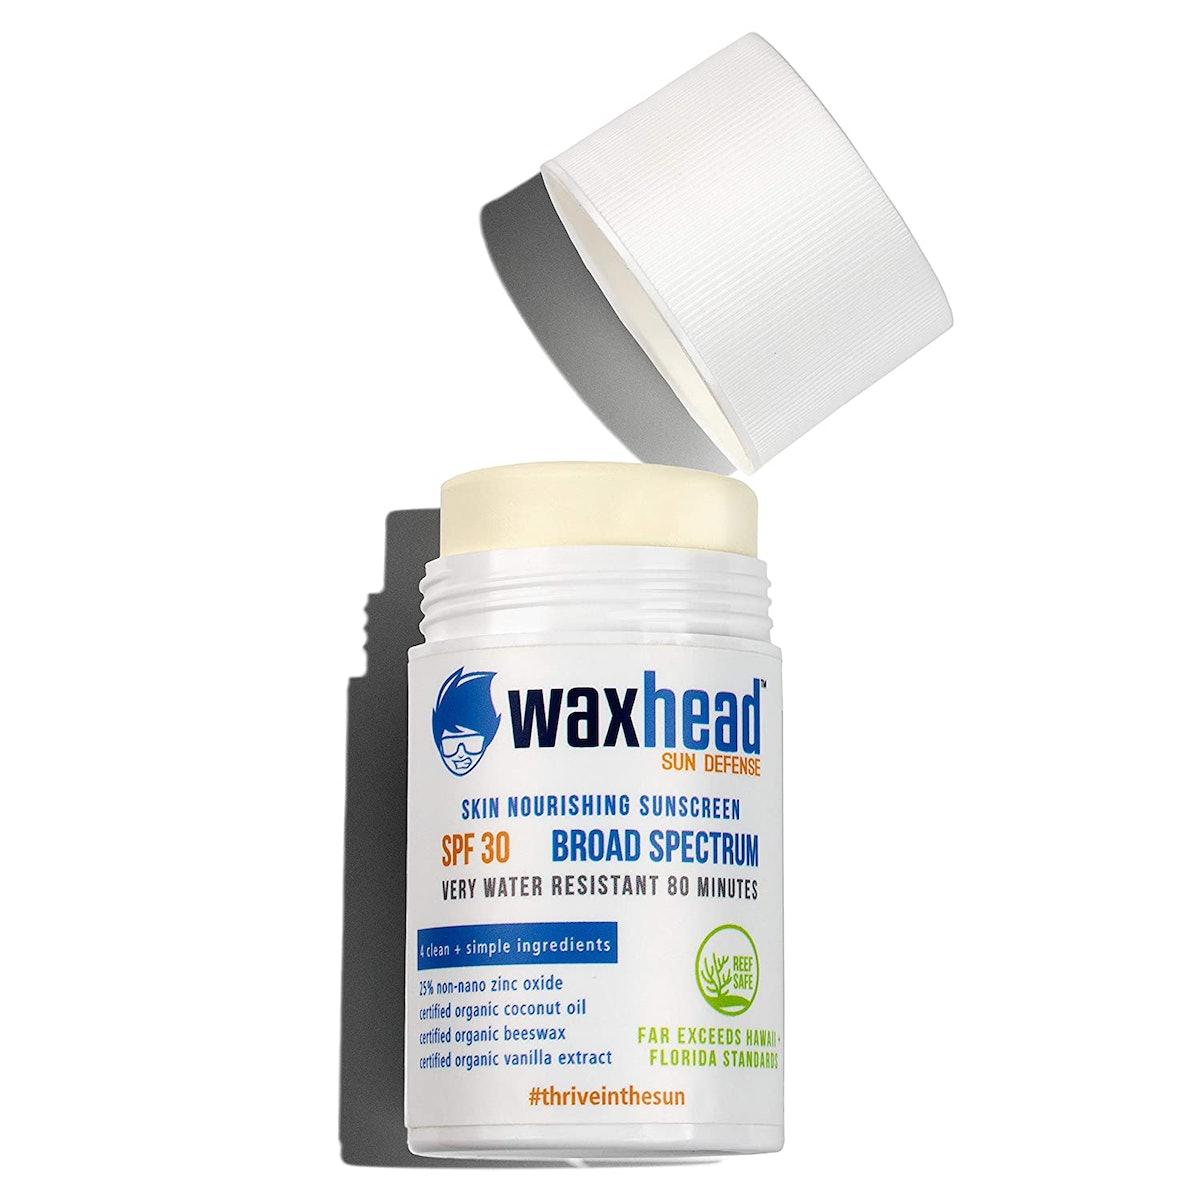 Waxhead Zinc Oxide Sunscreen Stick